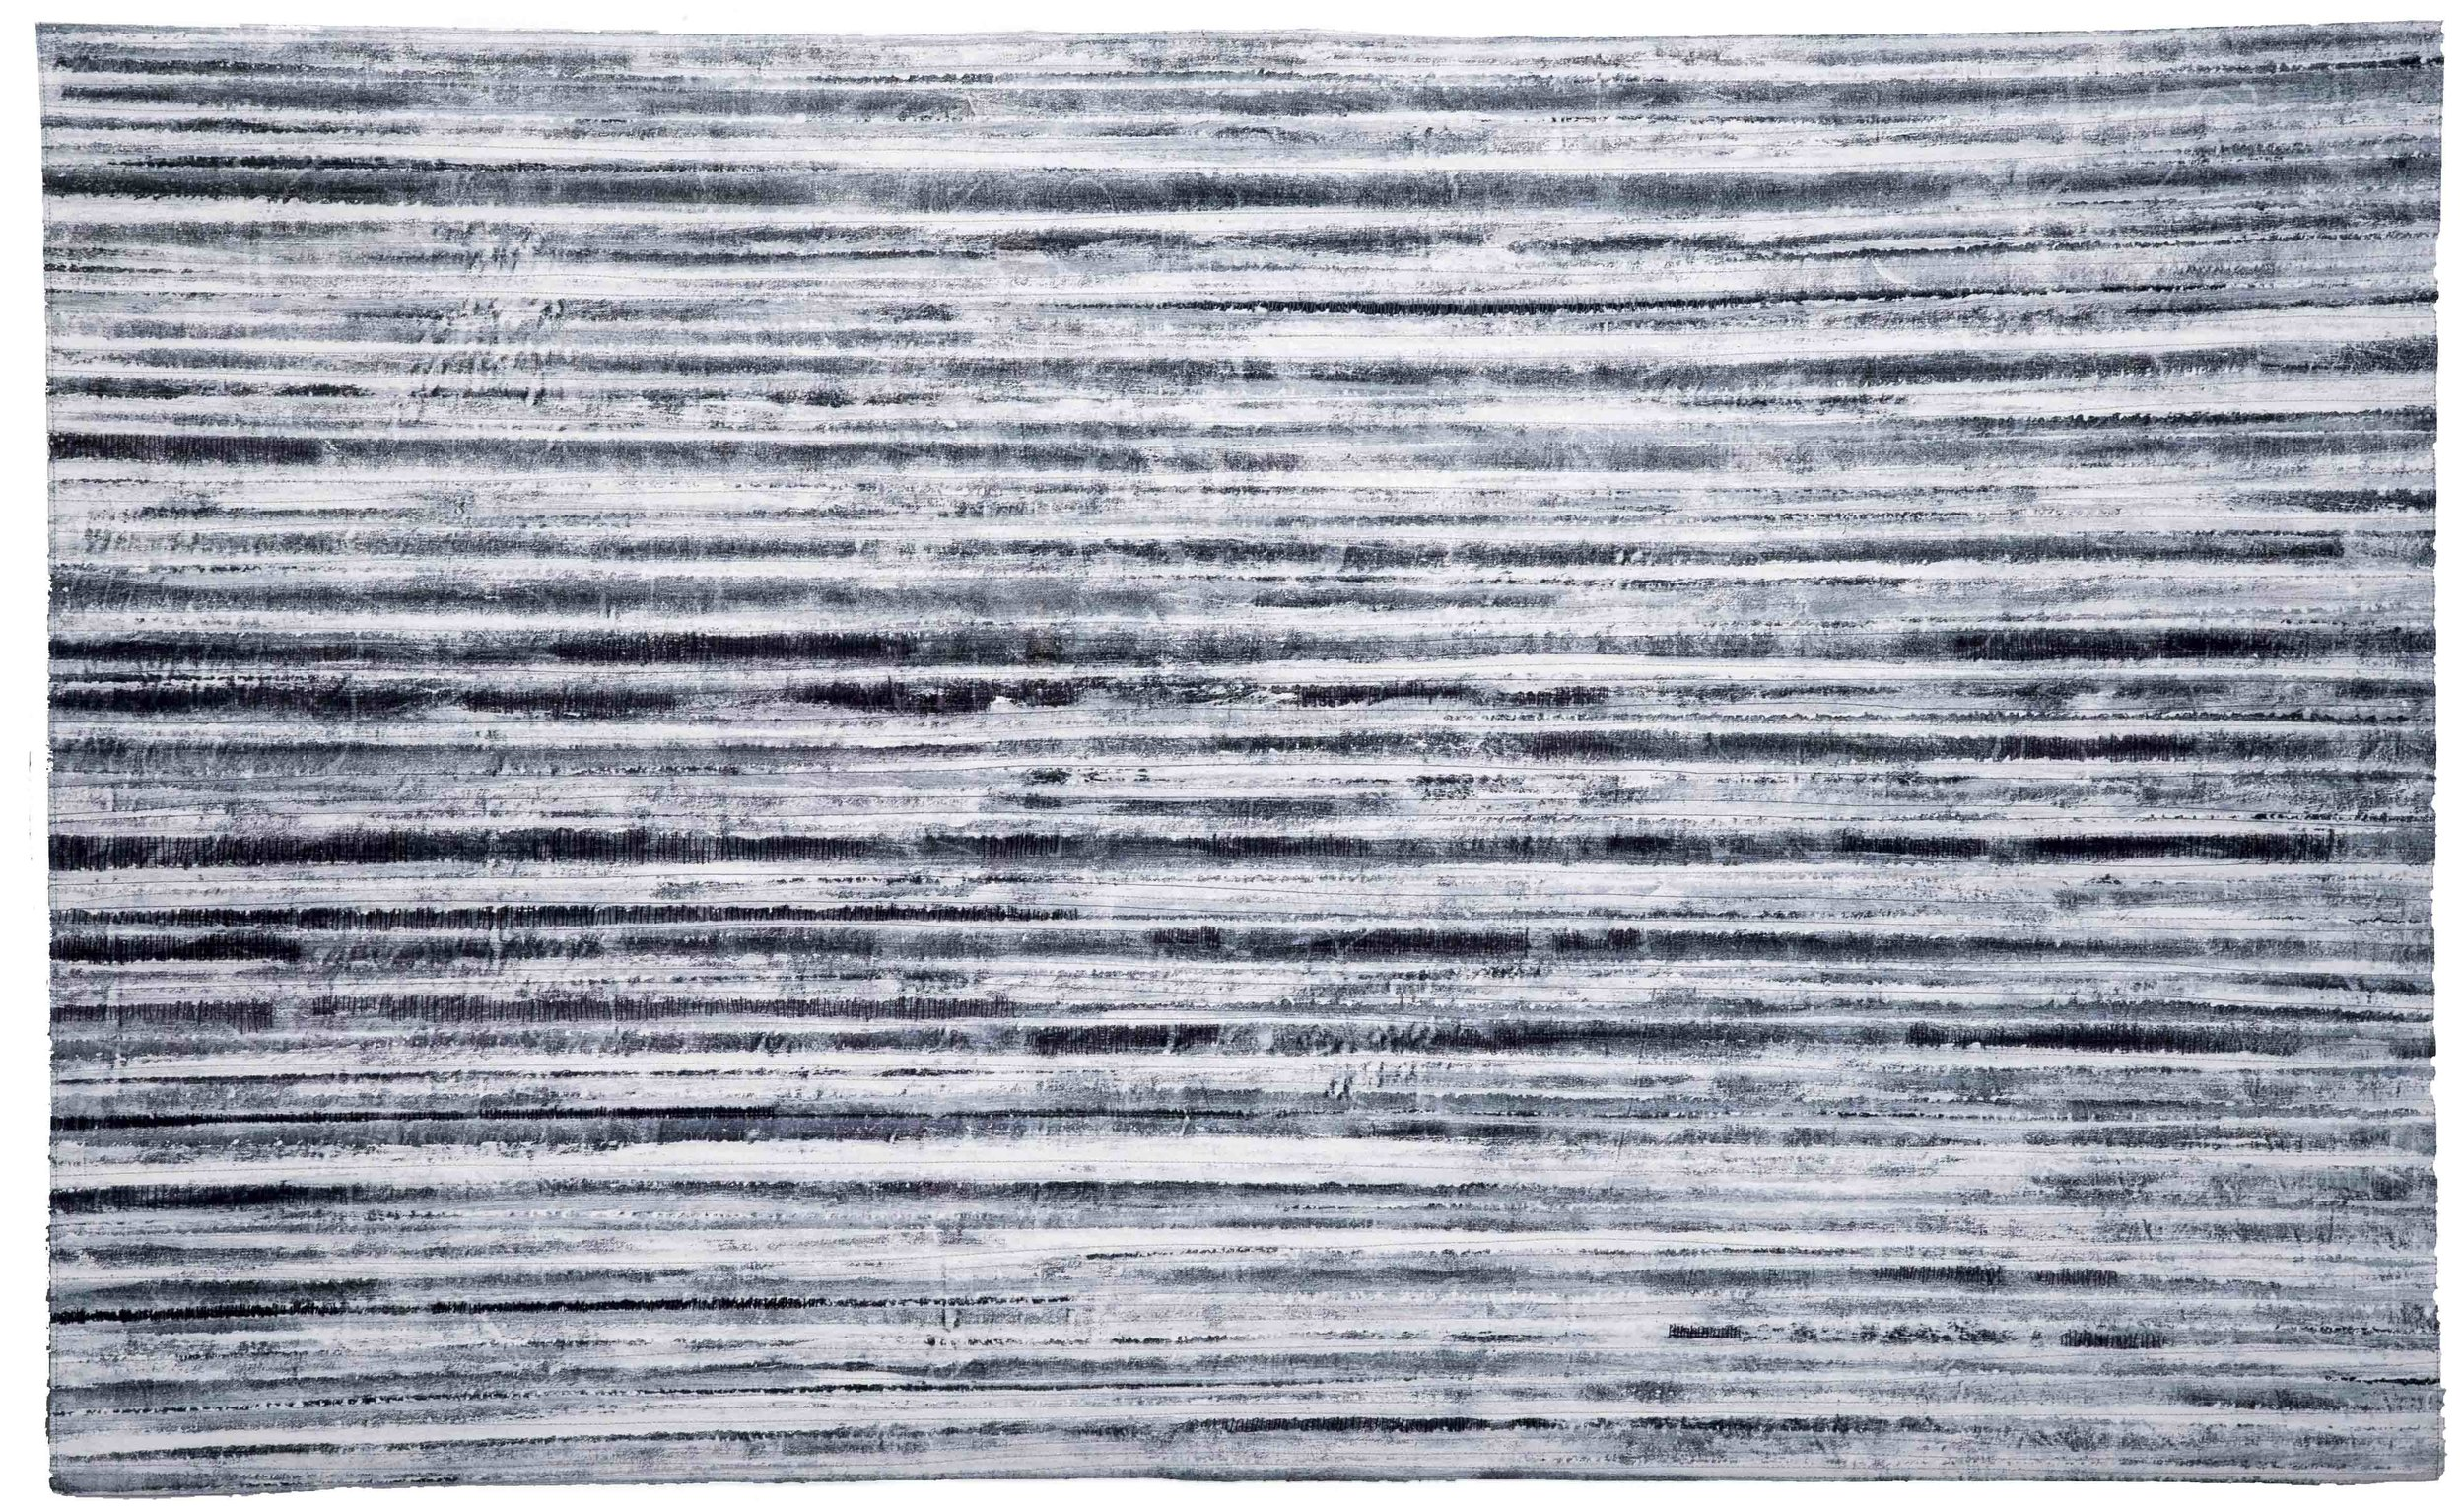 'Arctic Tundra', cotton, acrylic paint, machine and hand stitch. 142x87cm